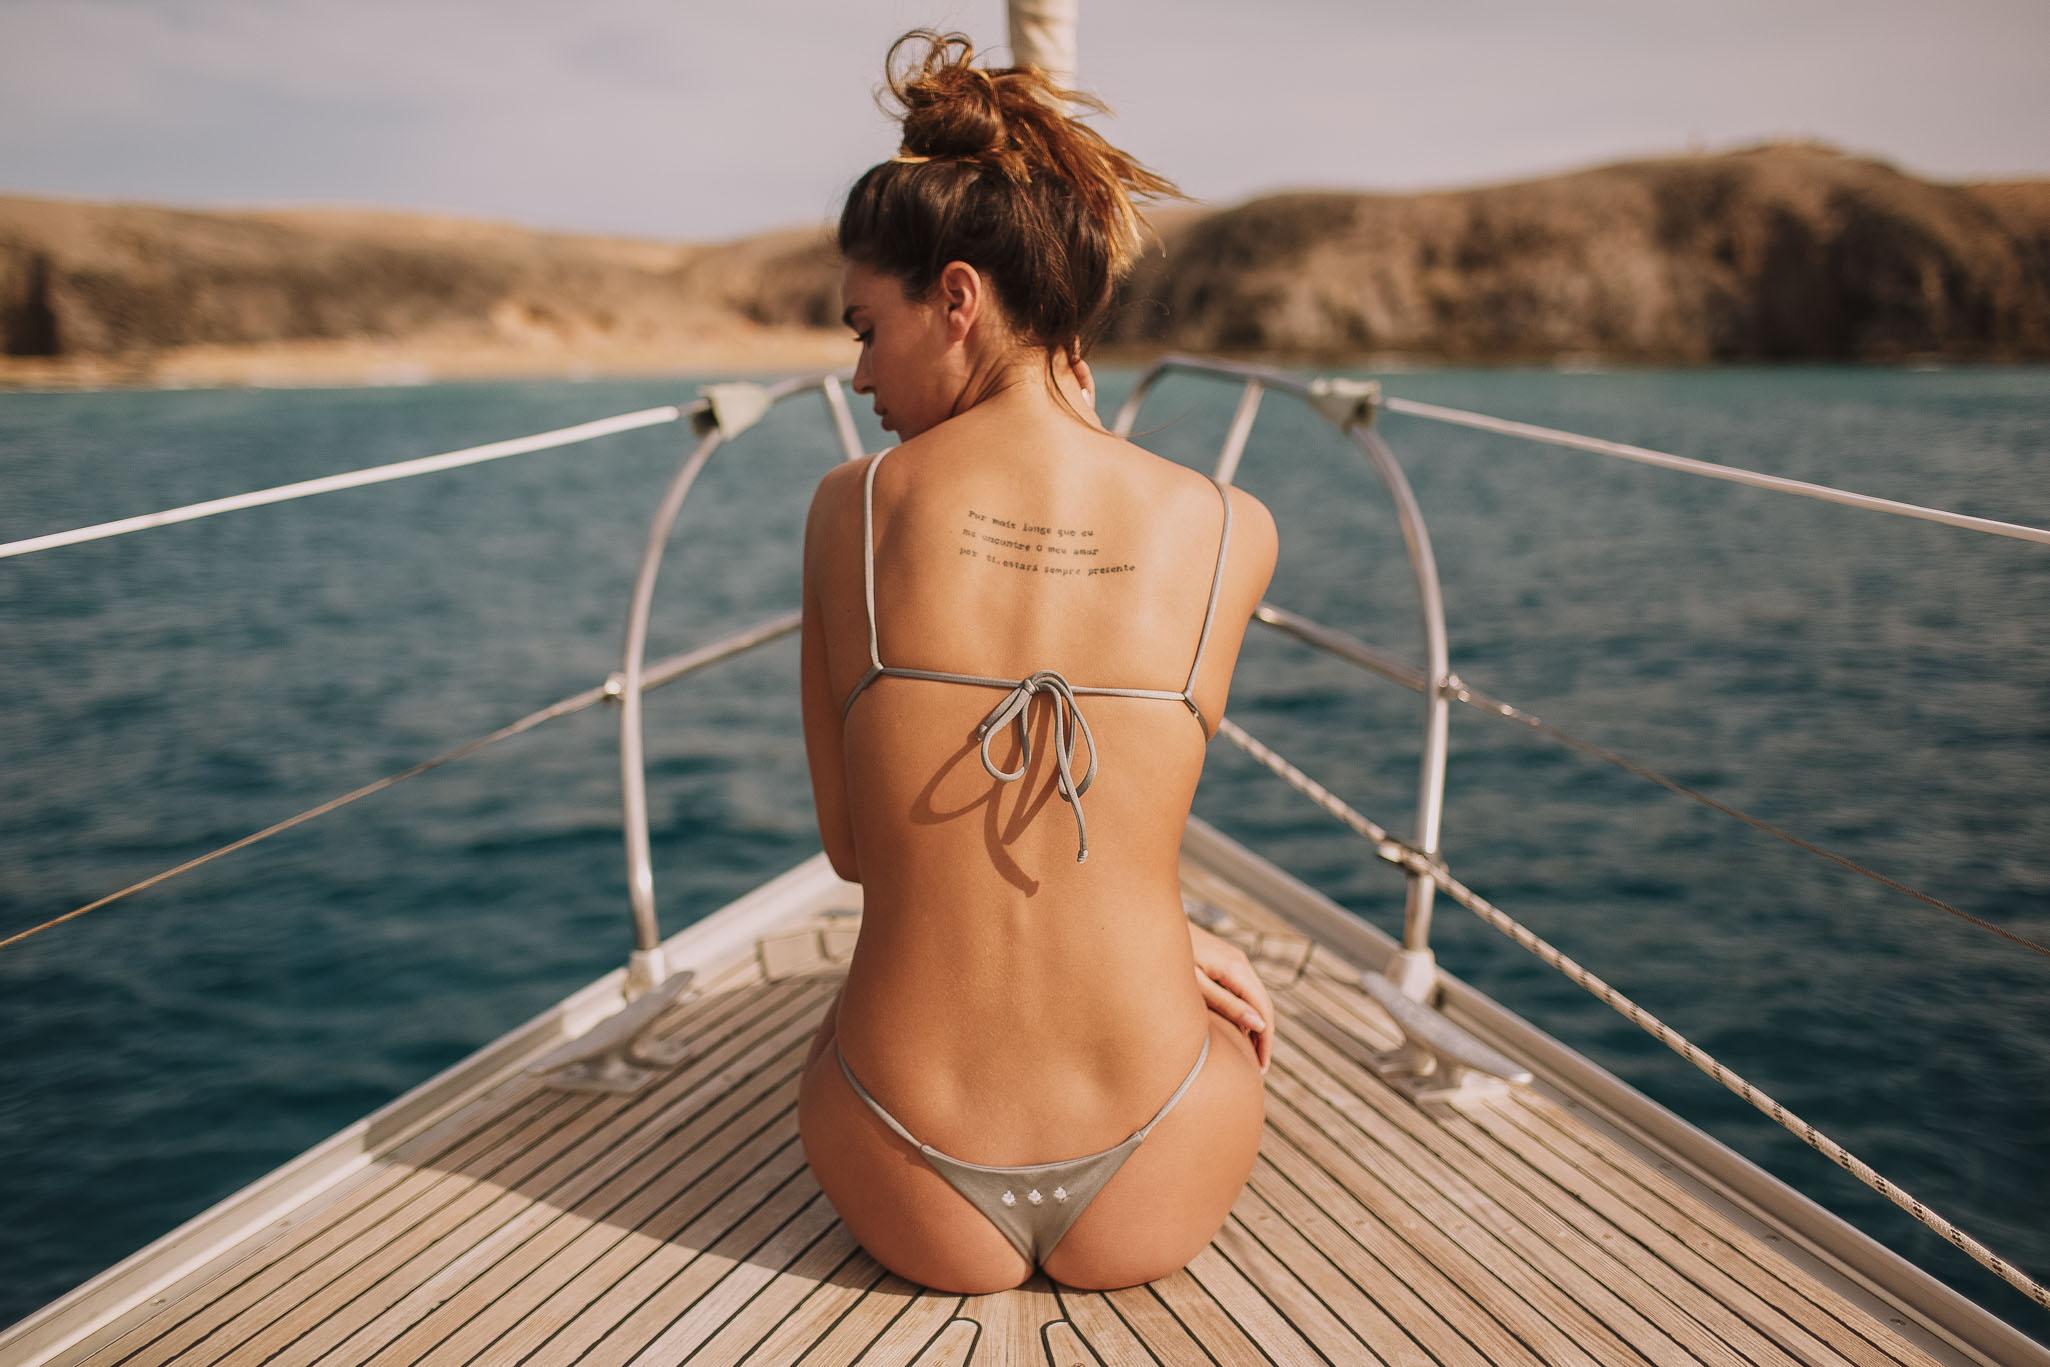 Swimwear-photographer-jeremy-boyer-maillot-de-bain-lifestyle-mode-fashion-swimsuit-16.jpg